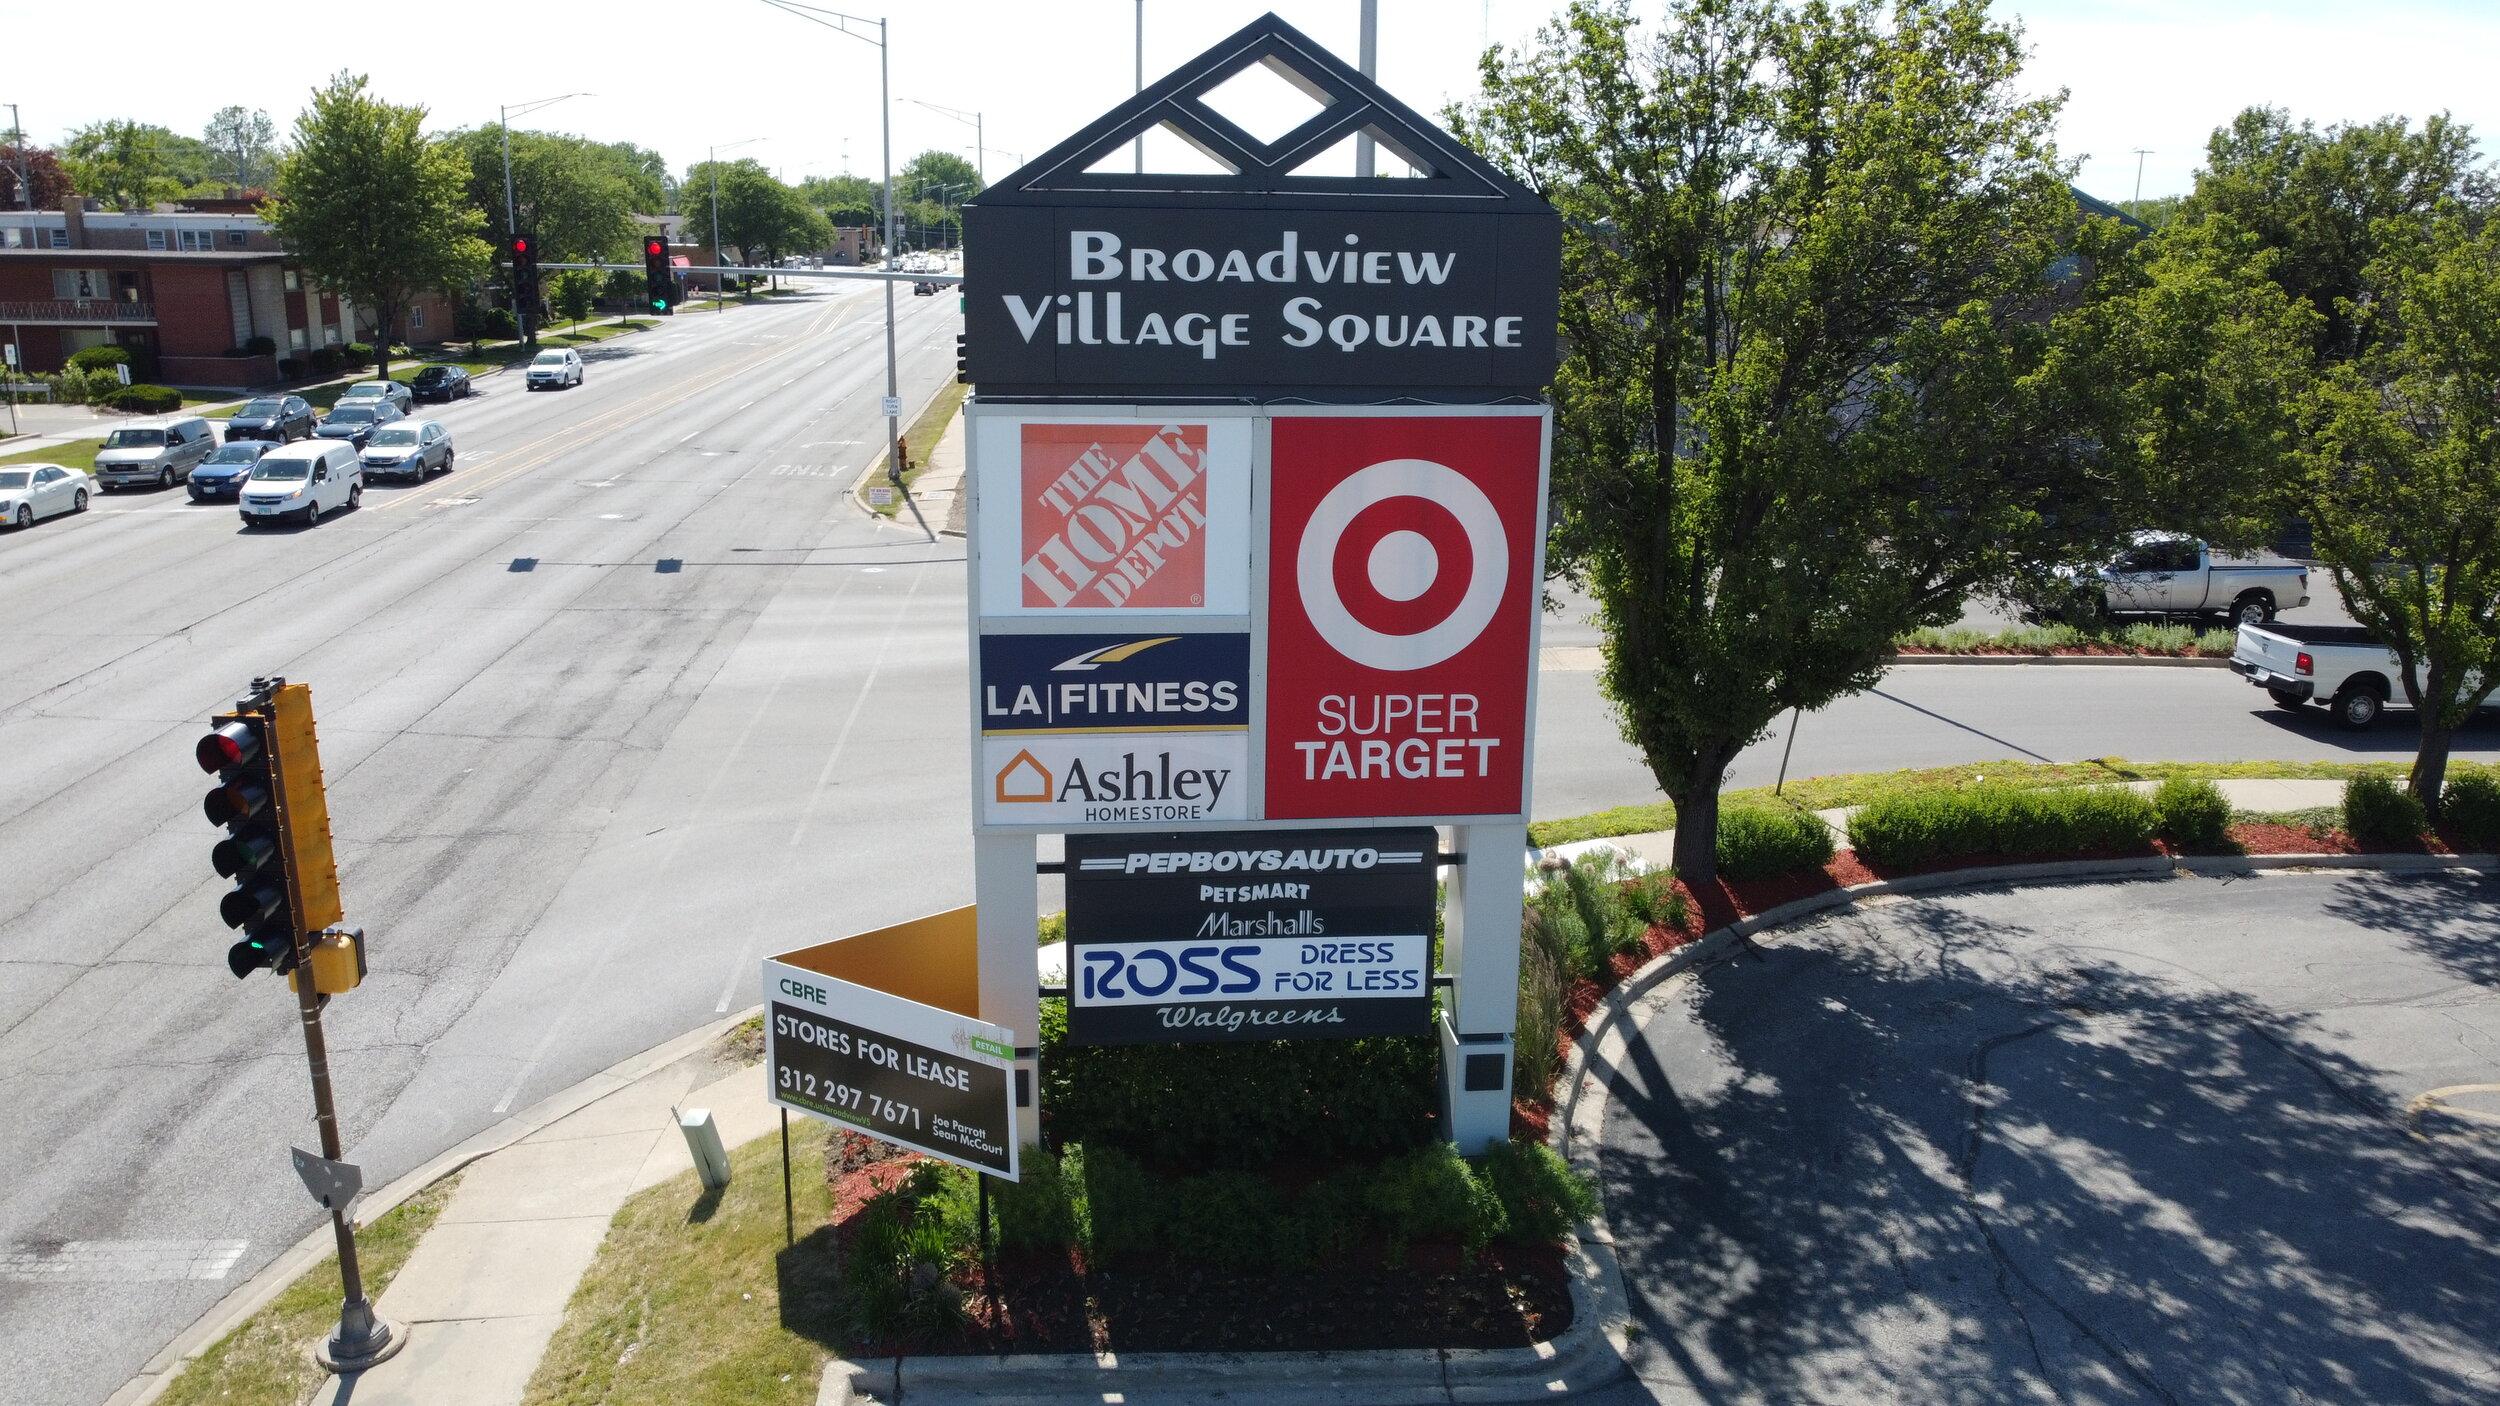 Broadview Village Square Bridge33